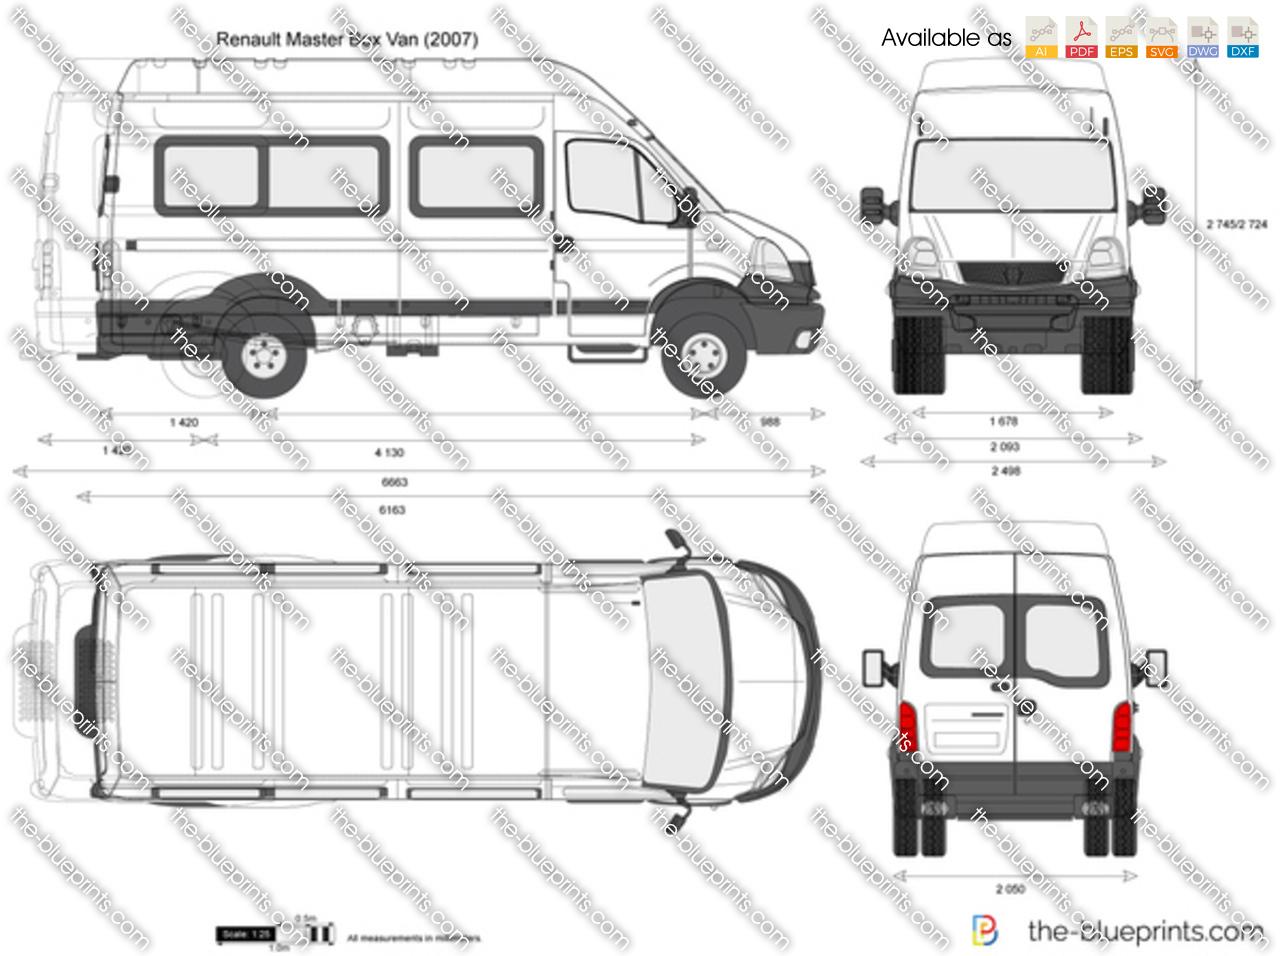 Renault Master Box Van vector drawing